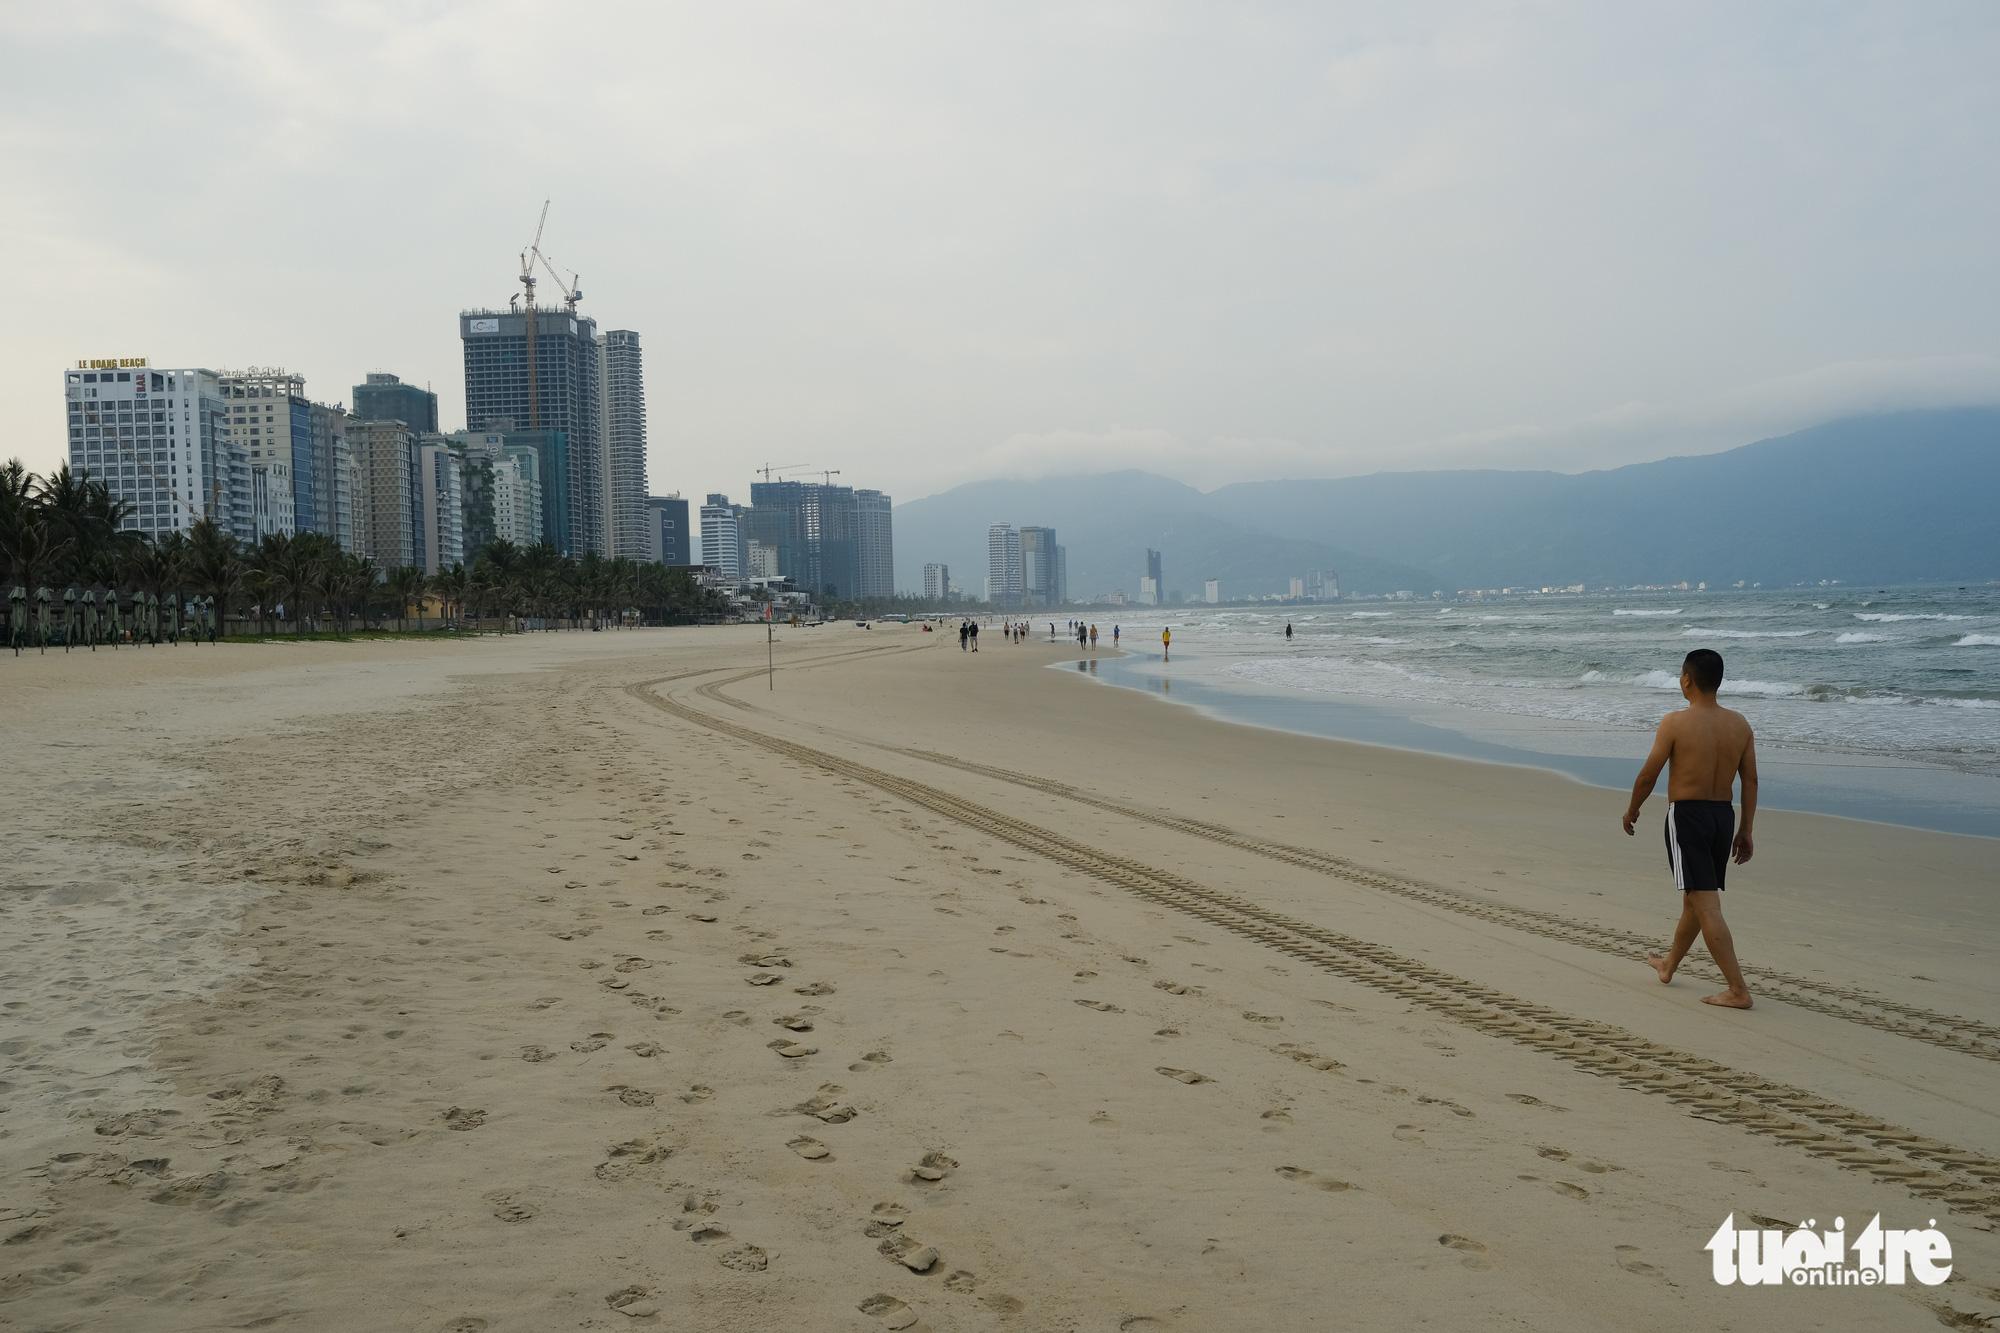 Visitors to Da Nang during holiday break plummet by 96% y-o-y